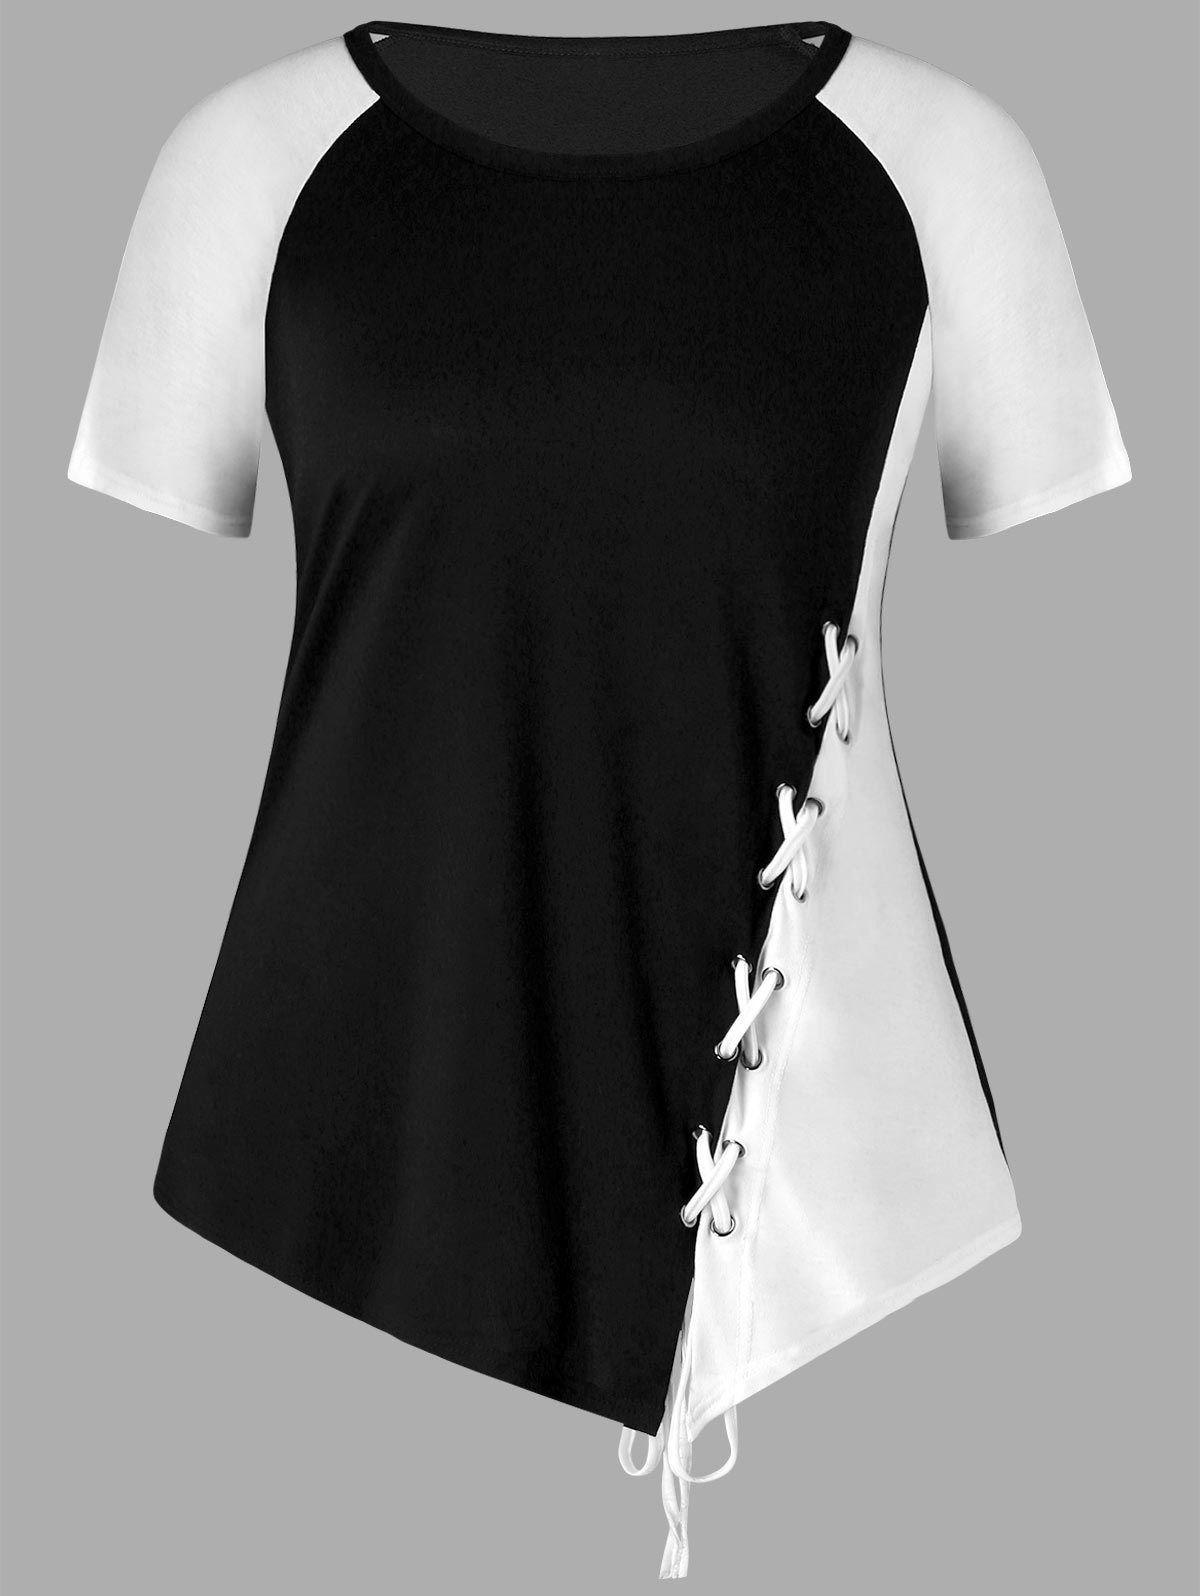 c66dce91c $9.99 - Plus Size Fashion Women Tops Blouse Lace Up Color Block Short Sleeve  Tee-Shirt #ebay #Fashion